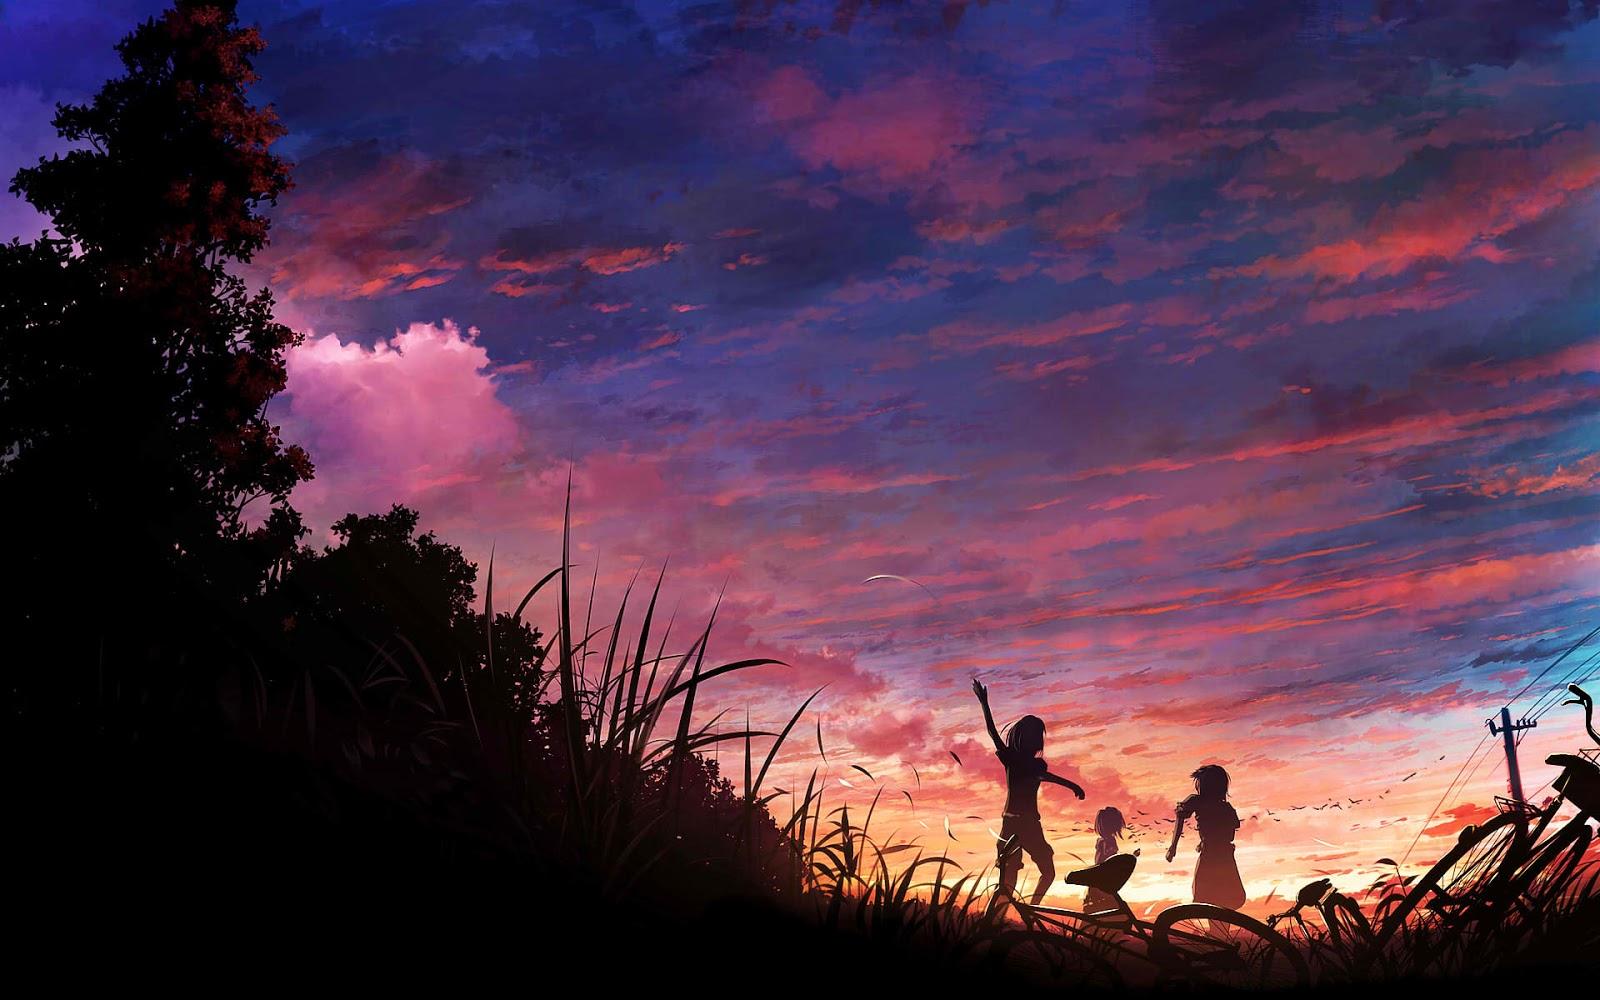 Beautiful world evangelion theme song 10